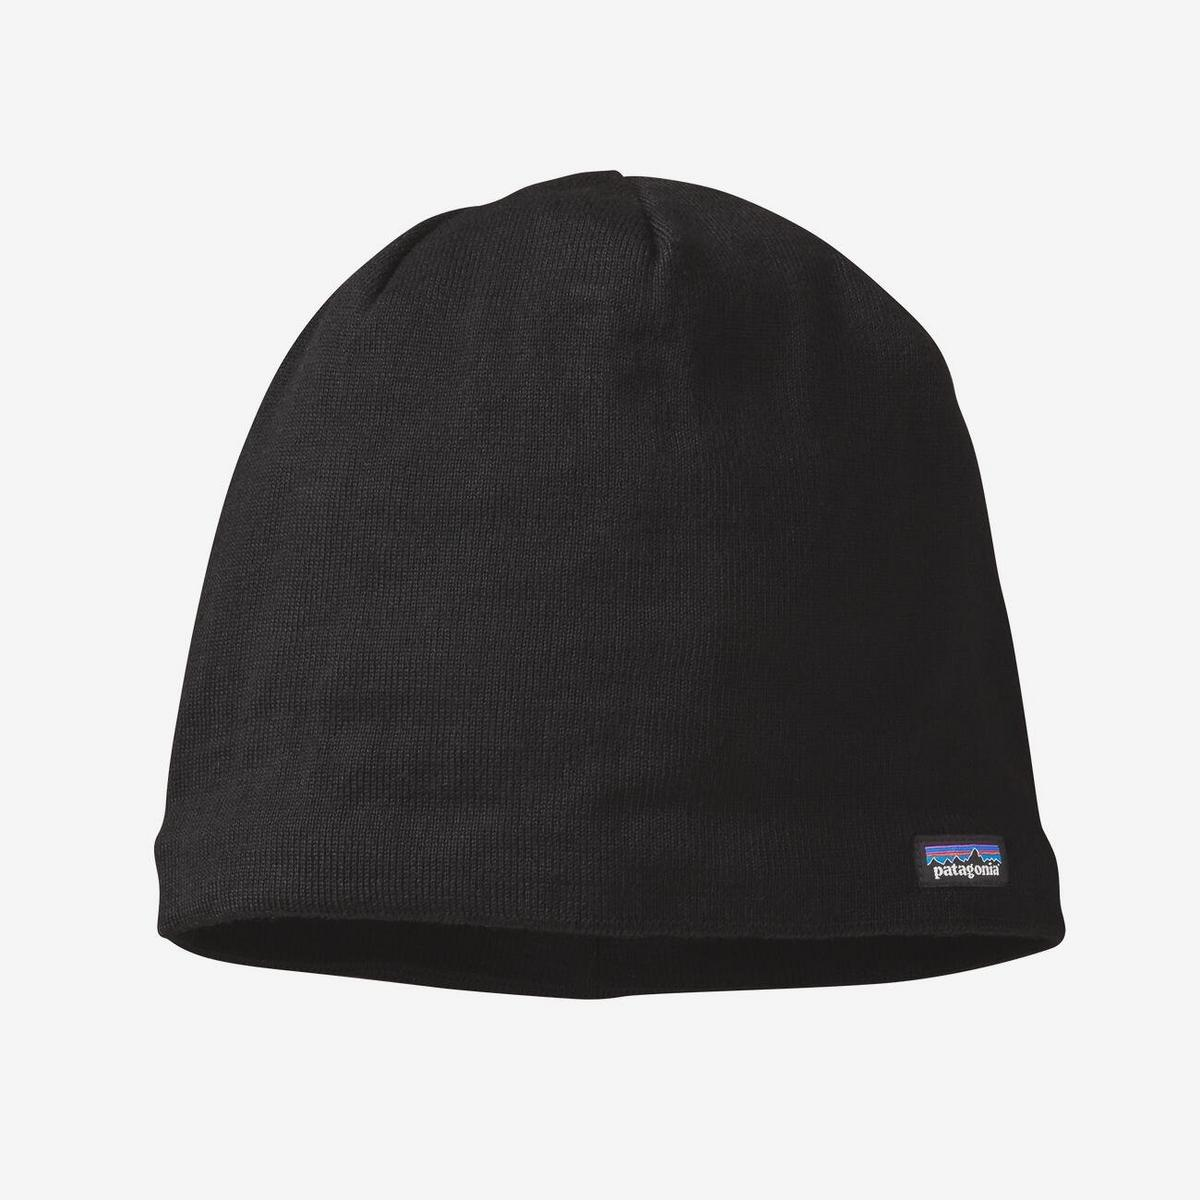 Patagonia U Patagonia Beanie Hat - Black